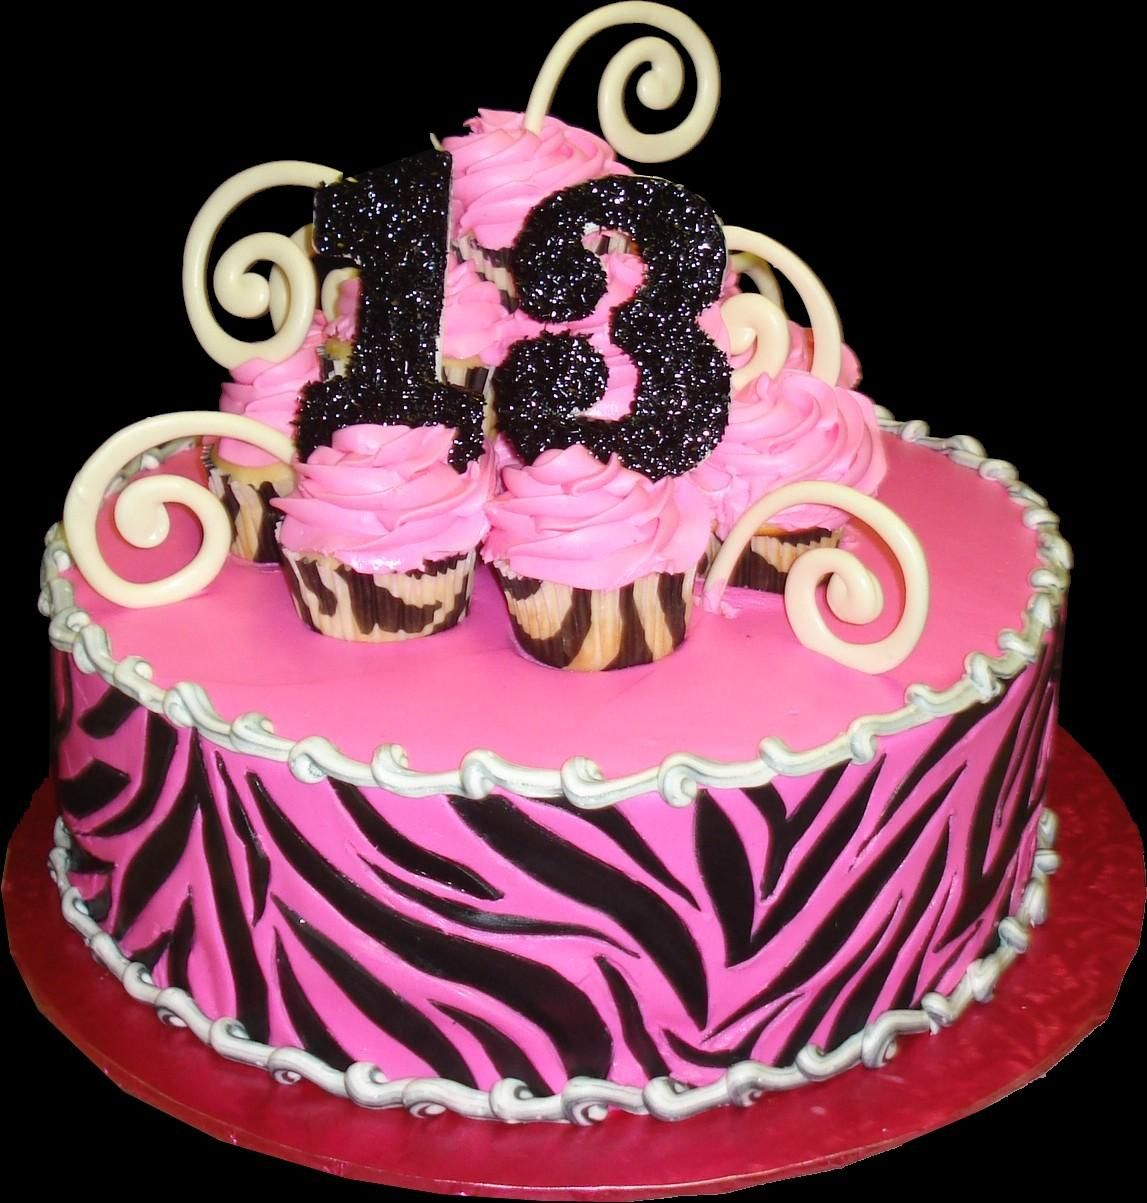 Zebra Pink 13th Birthday Cake Pink buttercream iced round